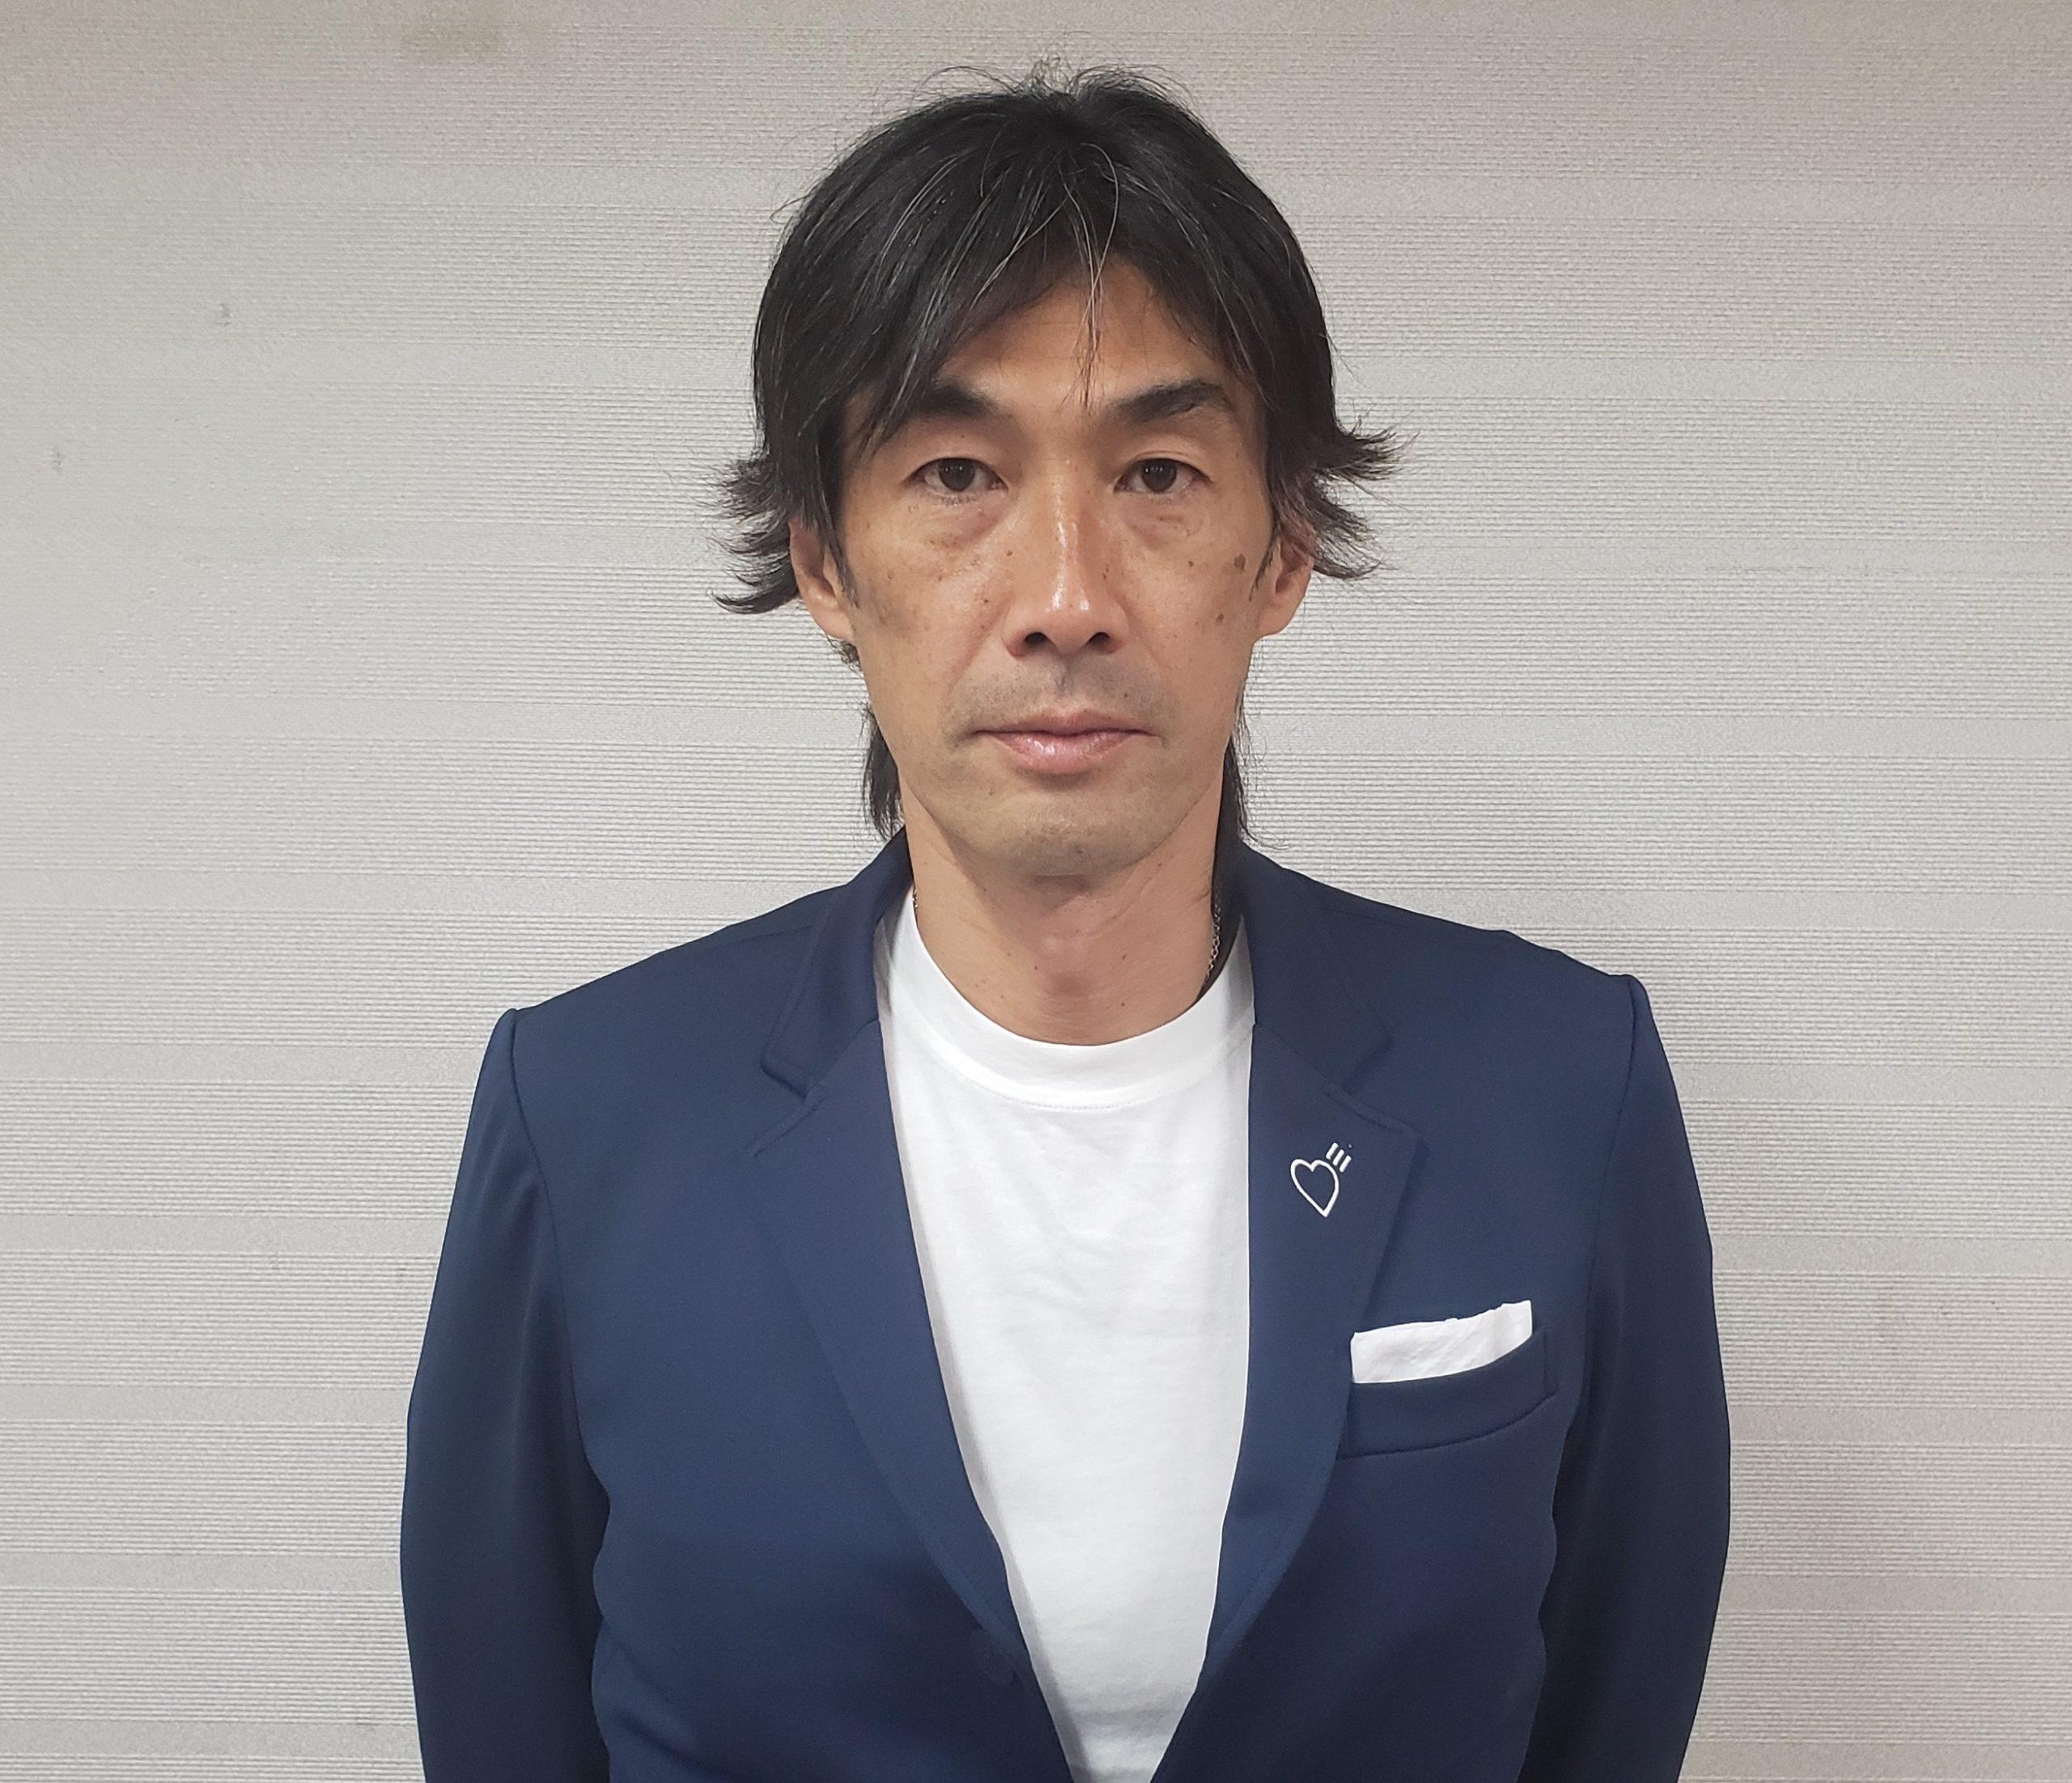 【チーム】岩本真典コーチが監督就任。来季体制発表(4月21日)